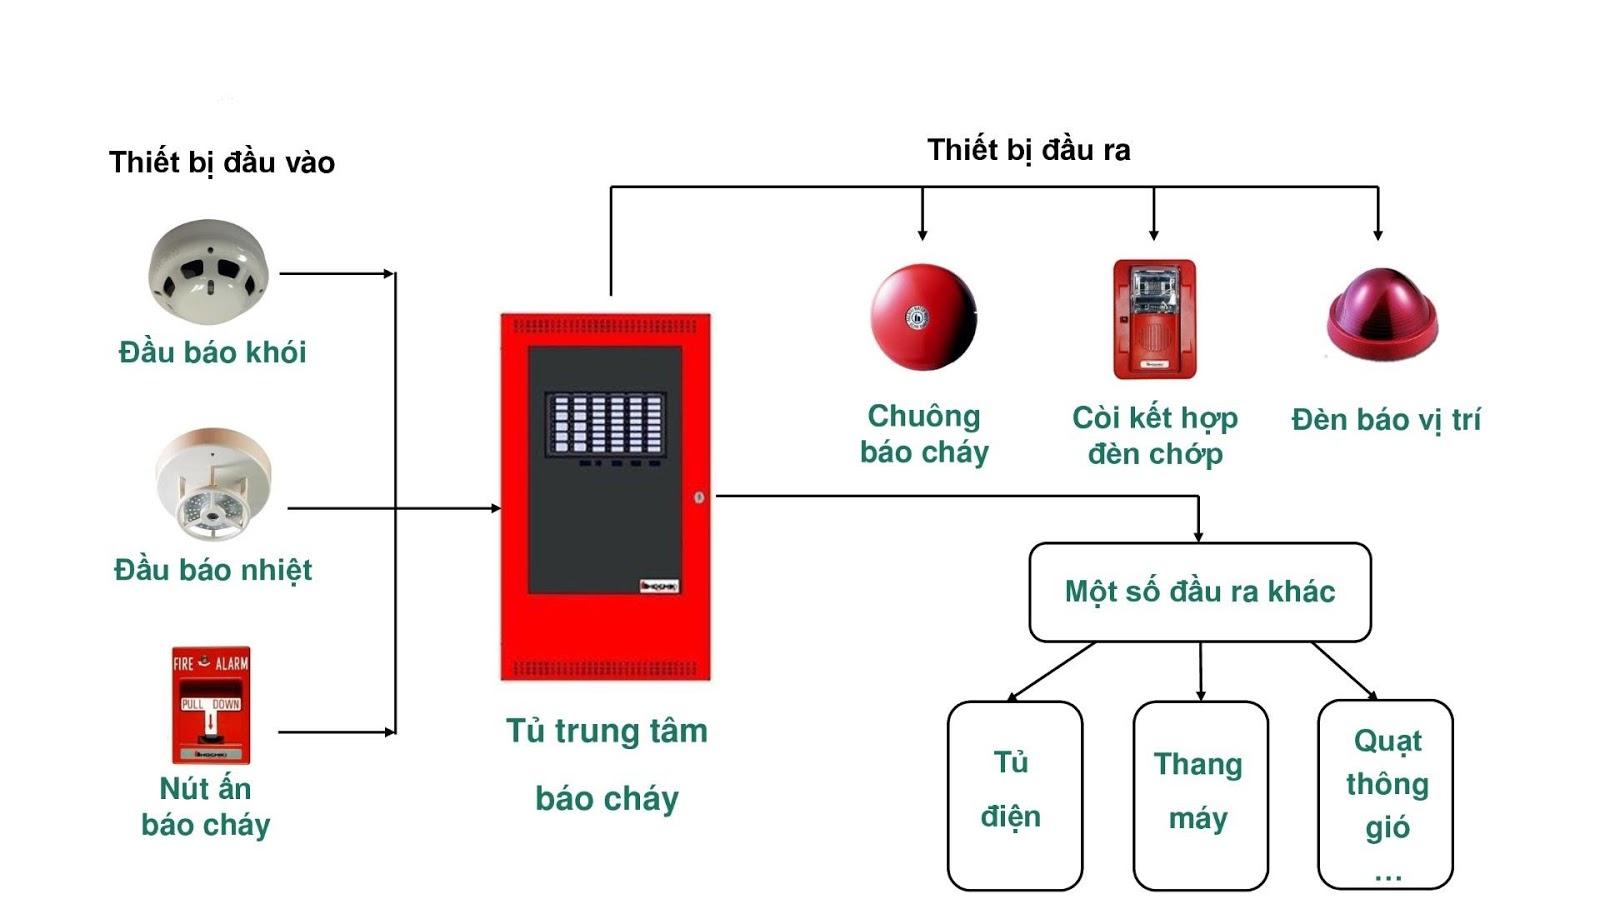 sua-chua-thong-bao-chay-tai-ha-noi1